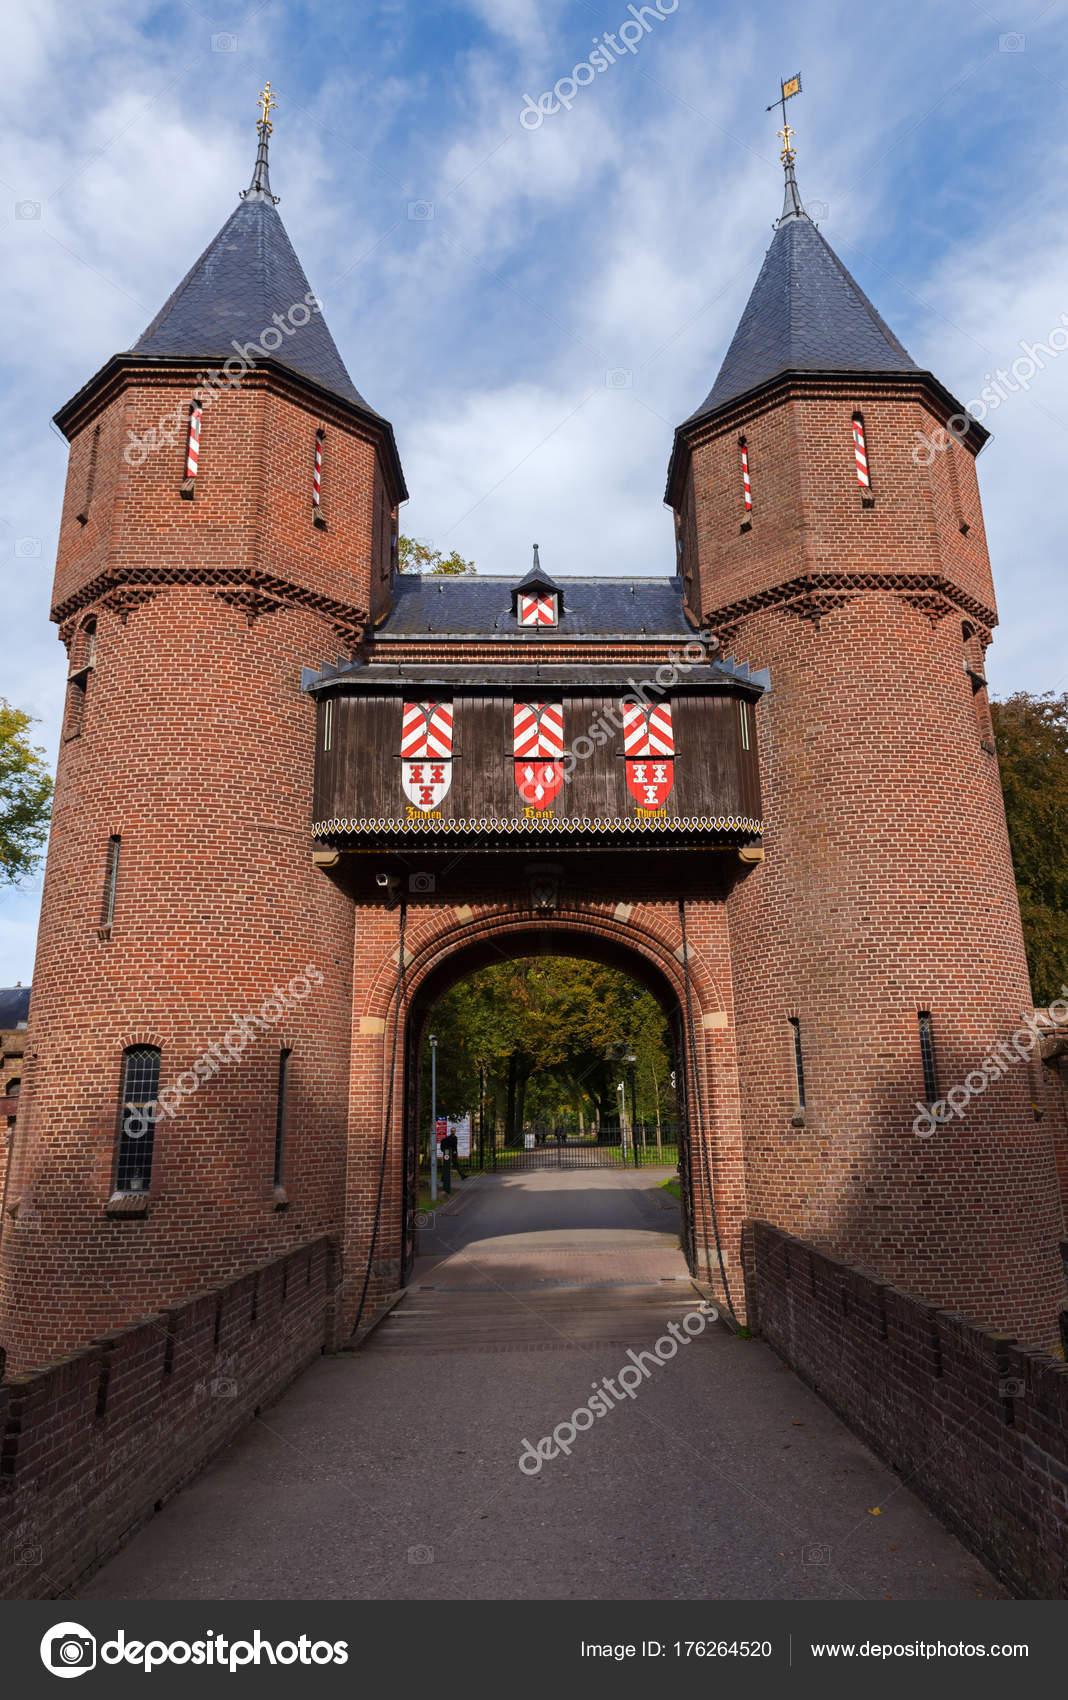 haarzuilens utrecht the netherlands october 8 2016 entrance gate of the medieval castle de haar photo by natap